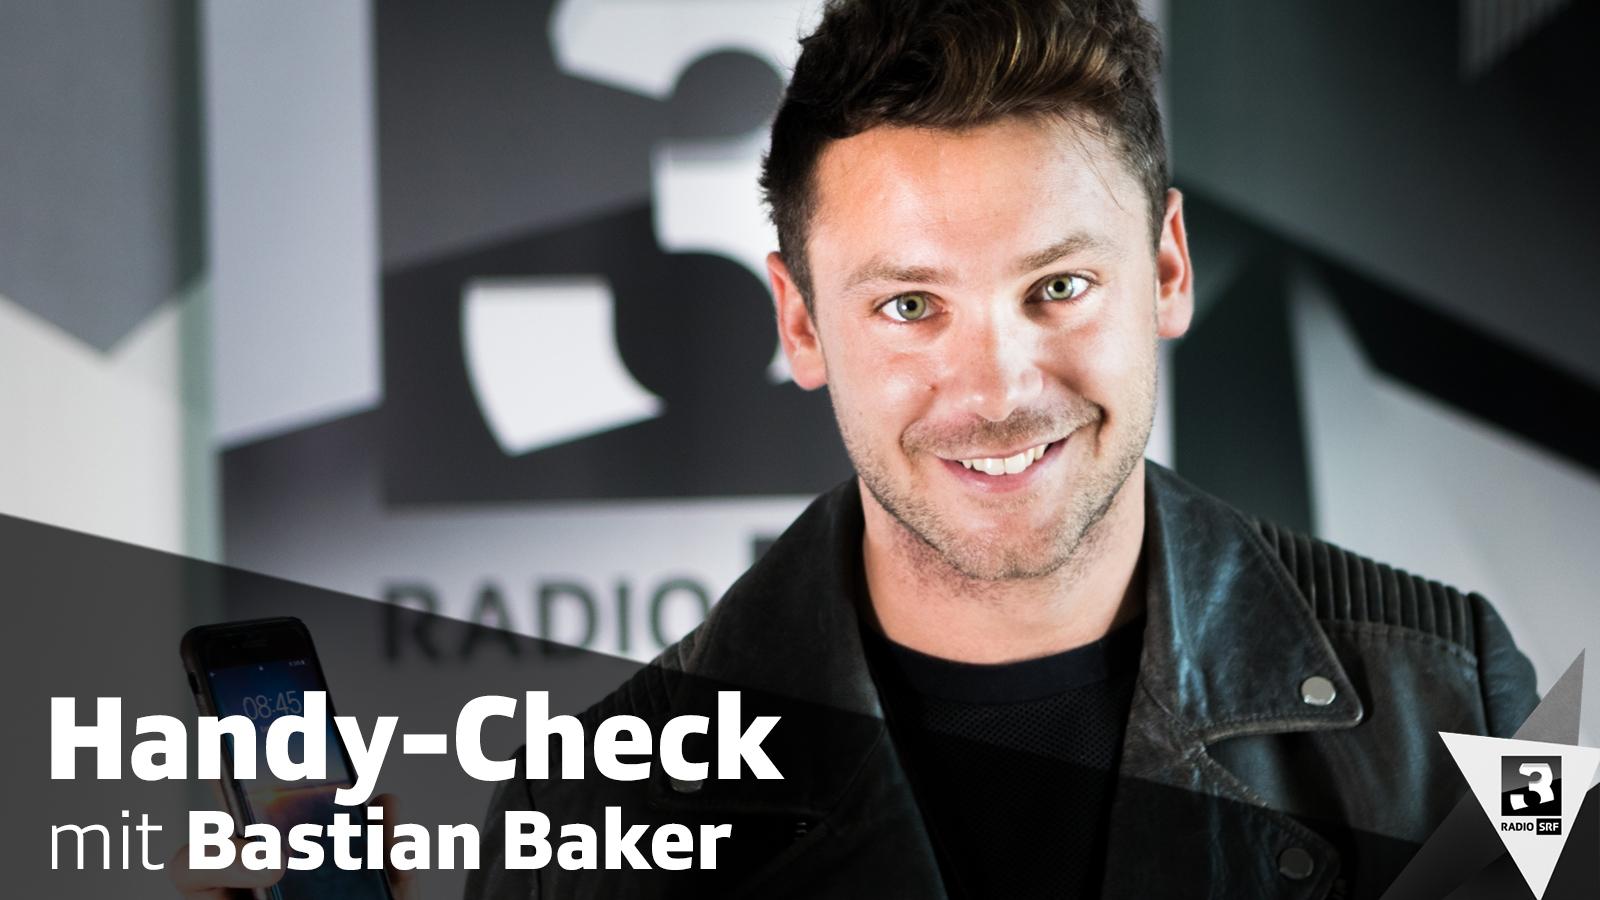 Handy-Check mit Bastian Baker